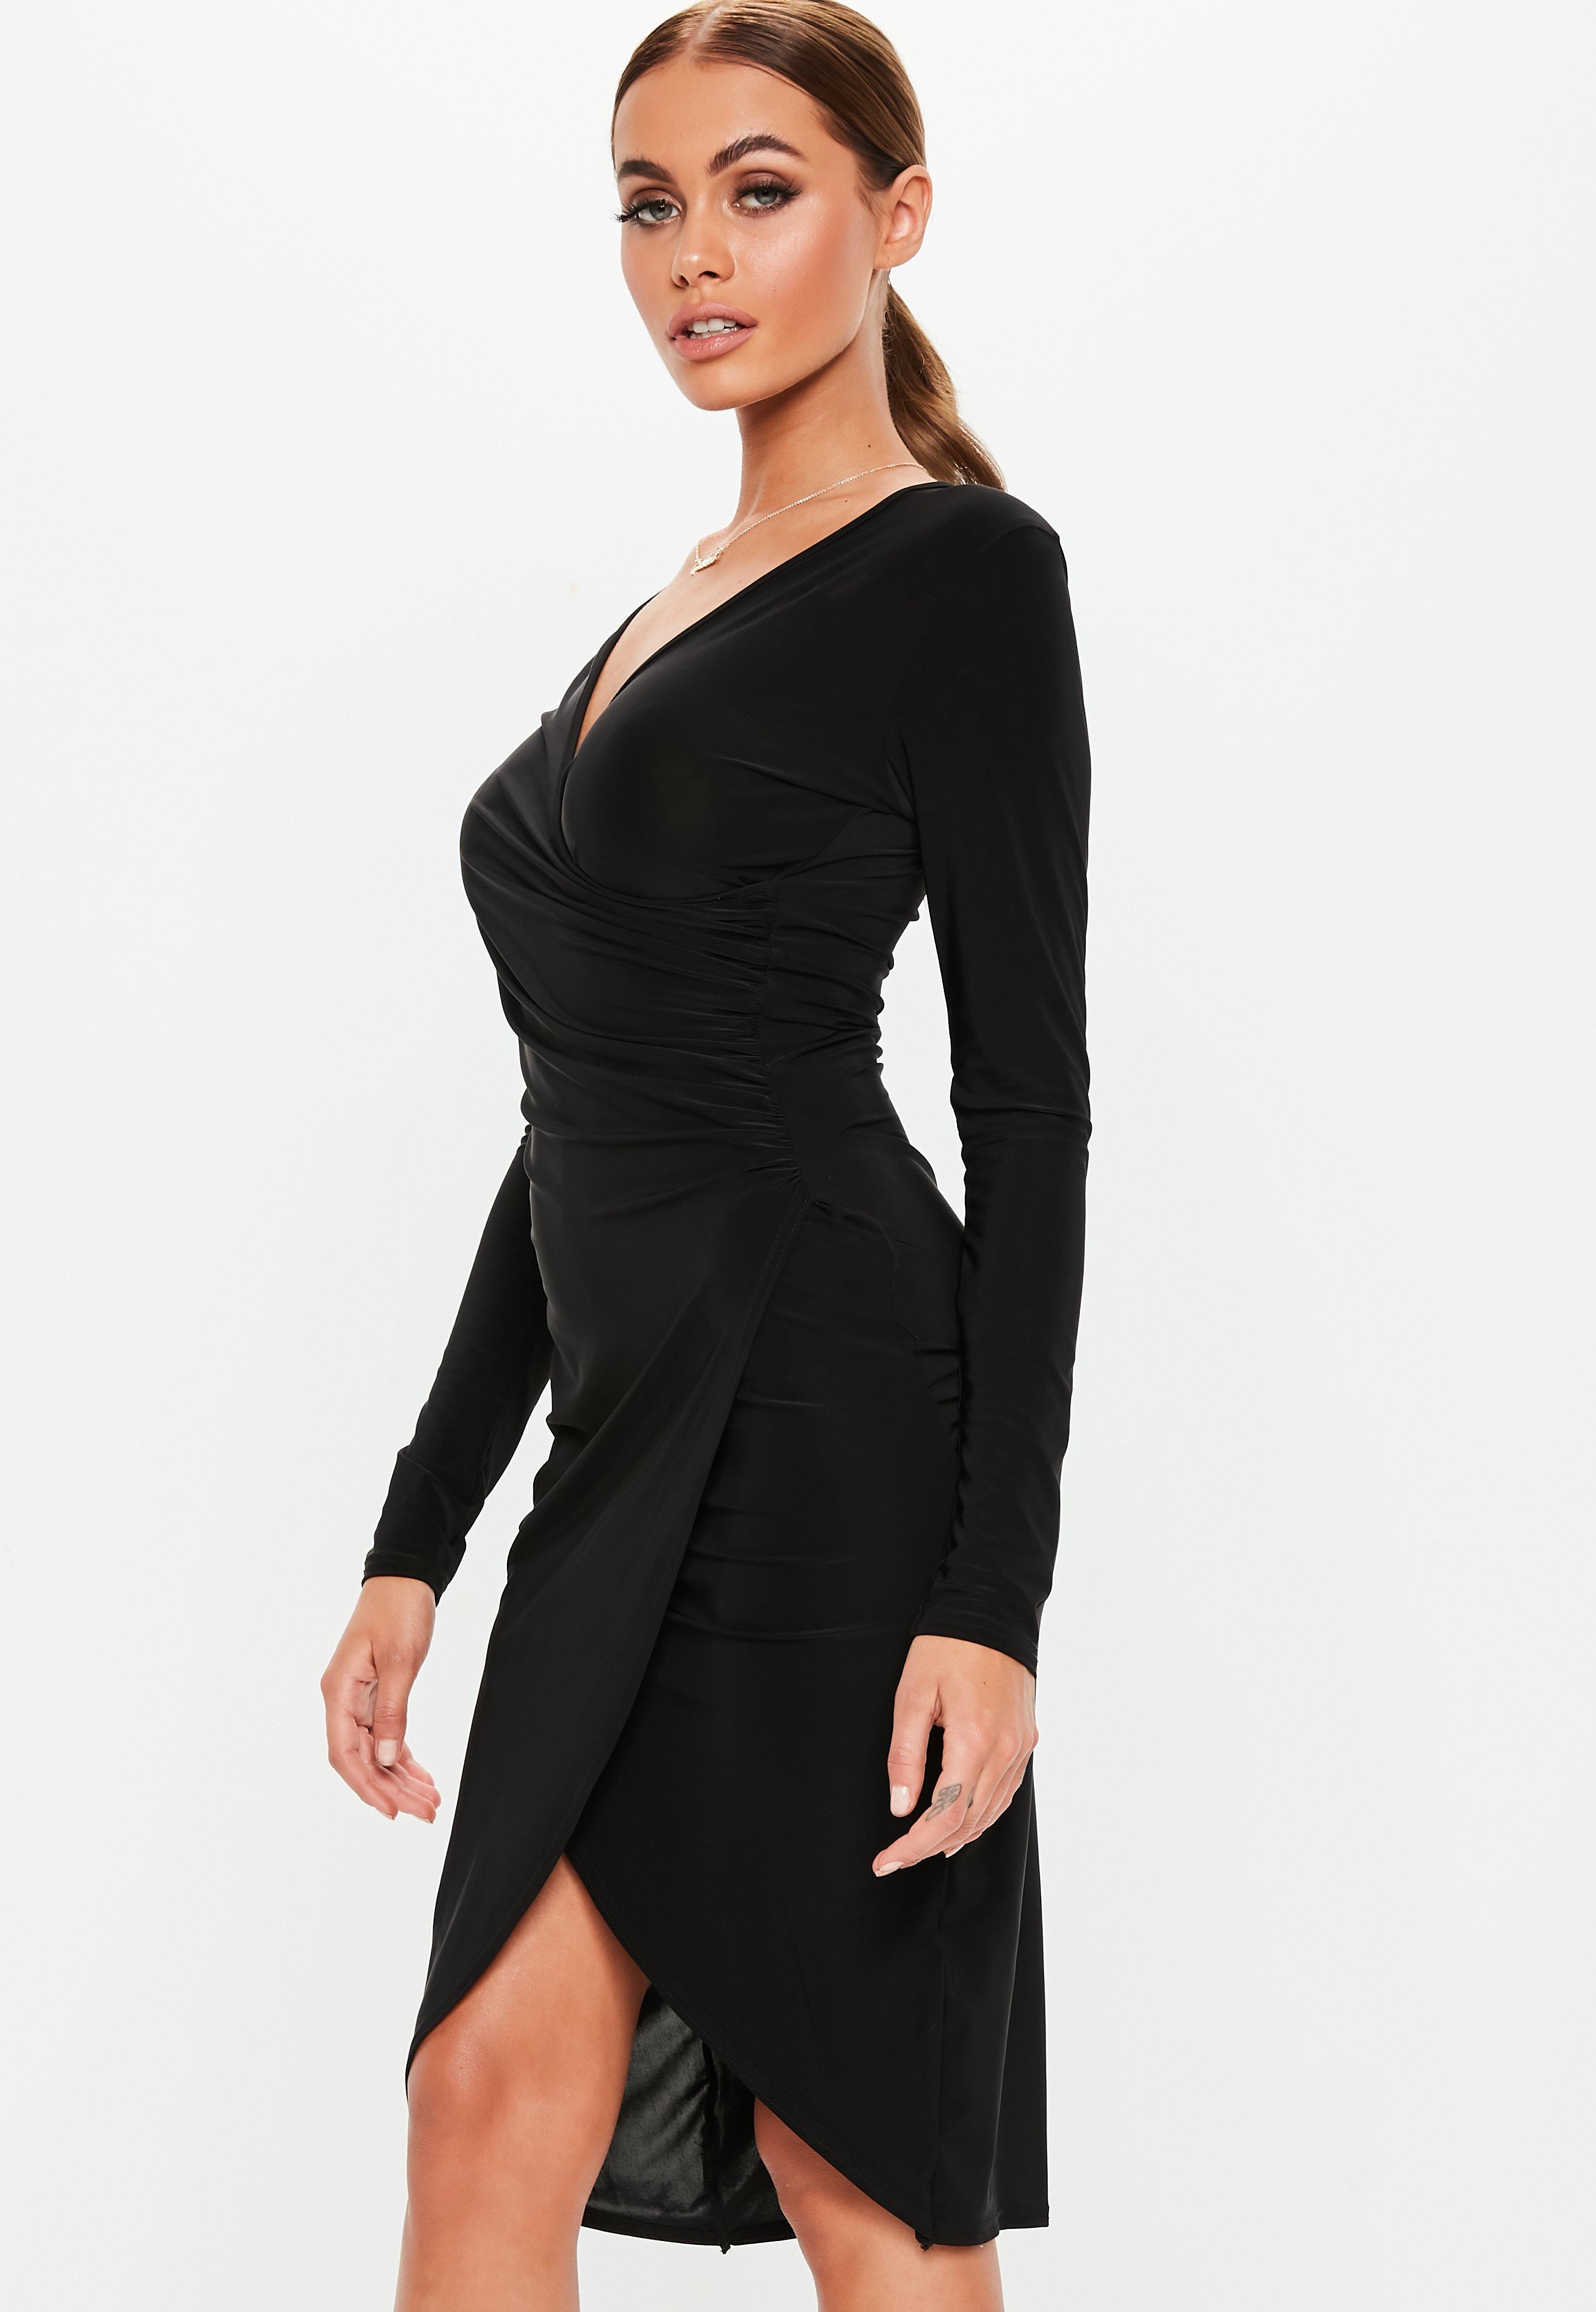 8ec02462a9c Lyst - Missguided Black Long Sleeve Slinky Wrap Midi Dress in Black